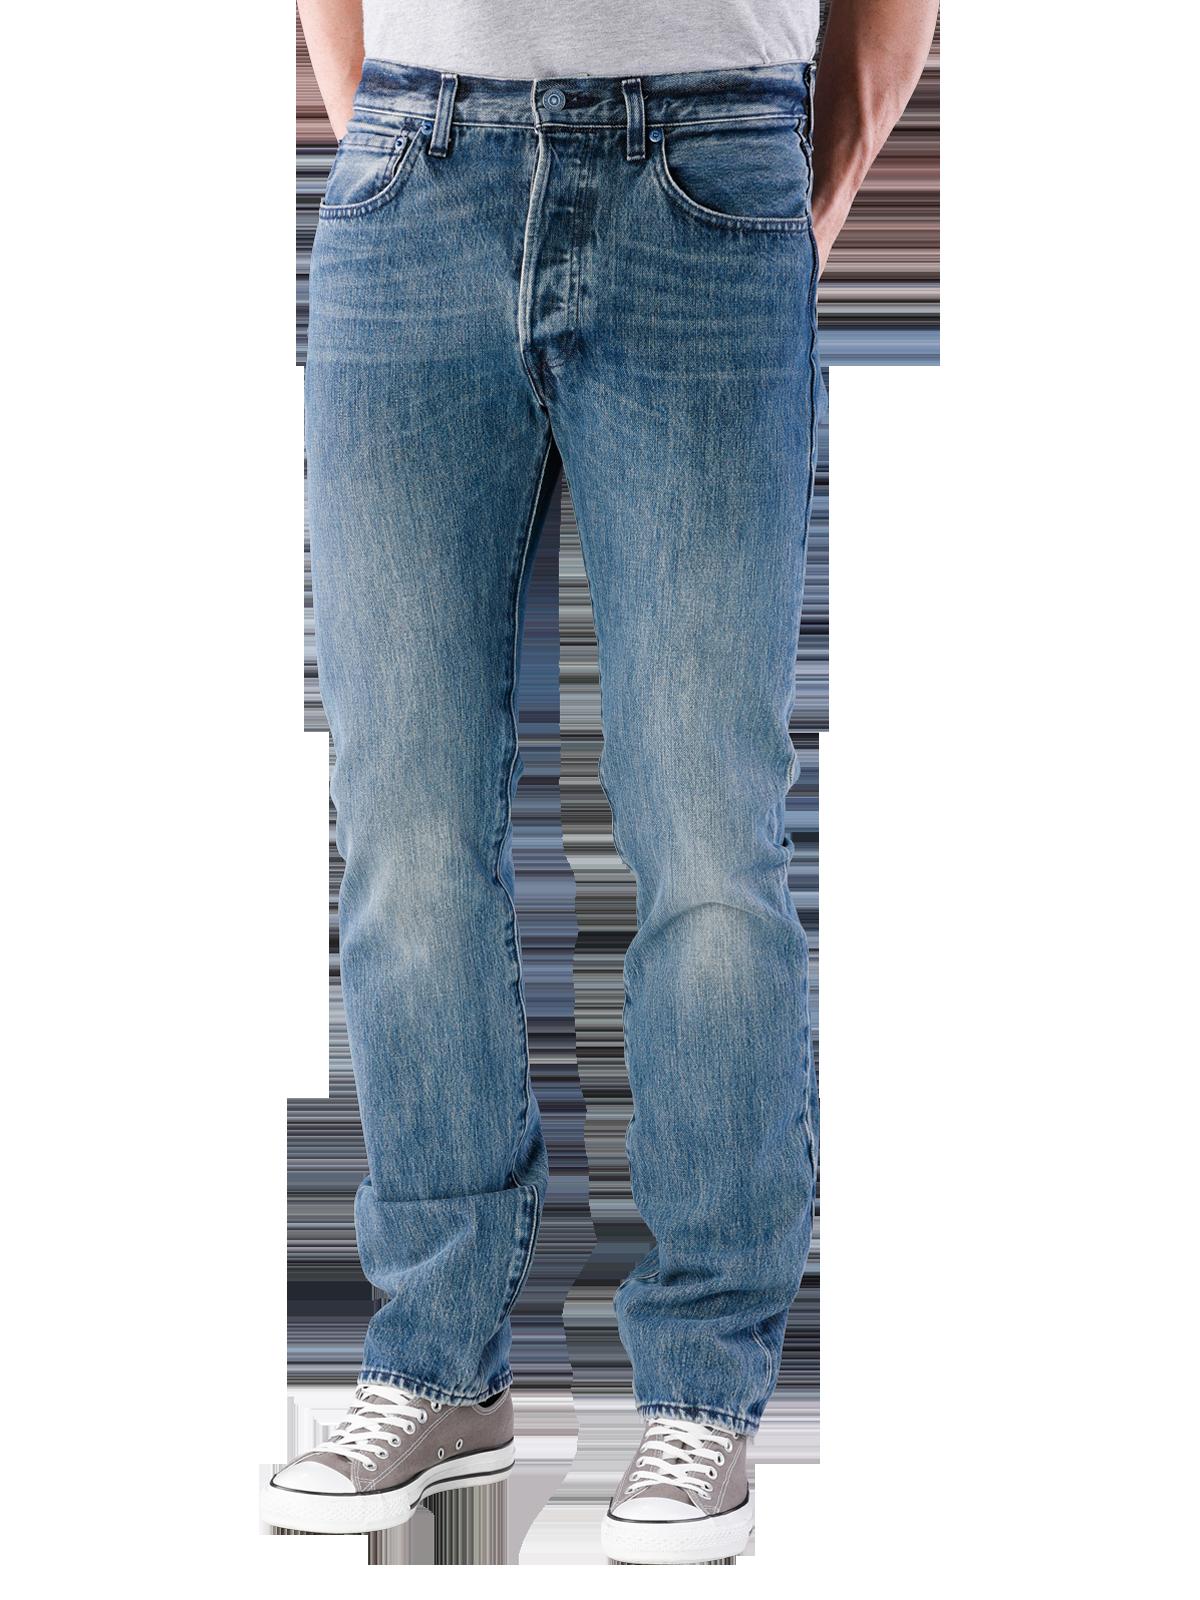 Levi's 501 Jeans Straight Fit tissue | Gratis Lieferung ... - Levi Strauss 501 Jeans